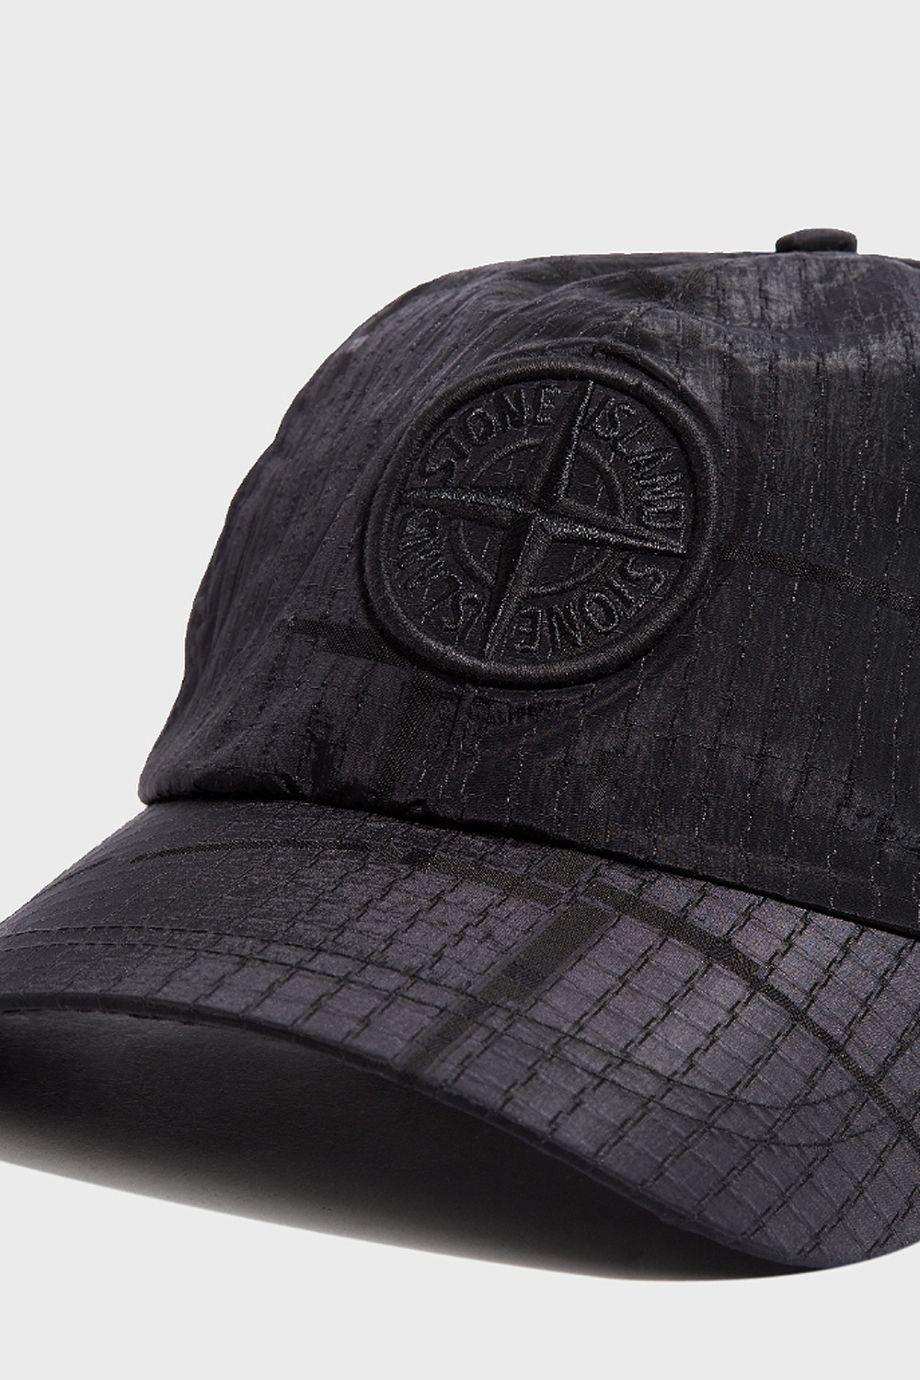 Stone Cap Detail : Lyst stone island metallic detail cap in black for men